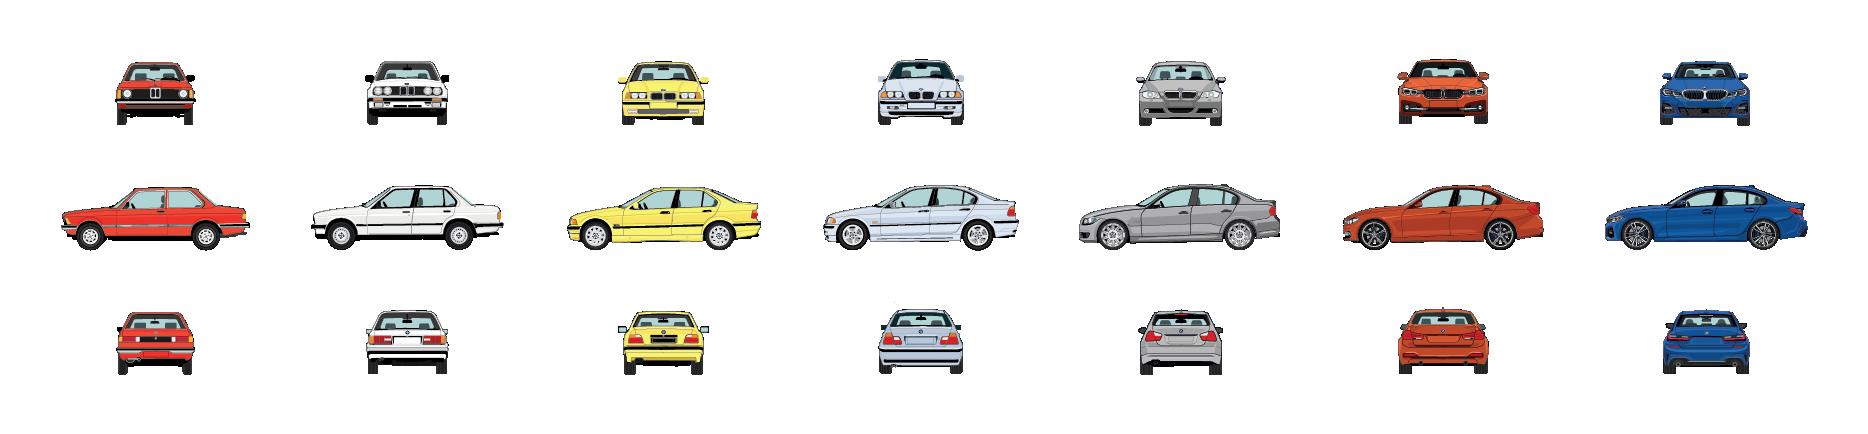 BMW 3 Series: a Journey through the Generations | BMW com